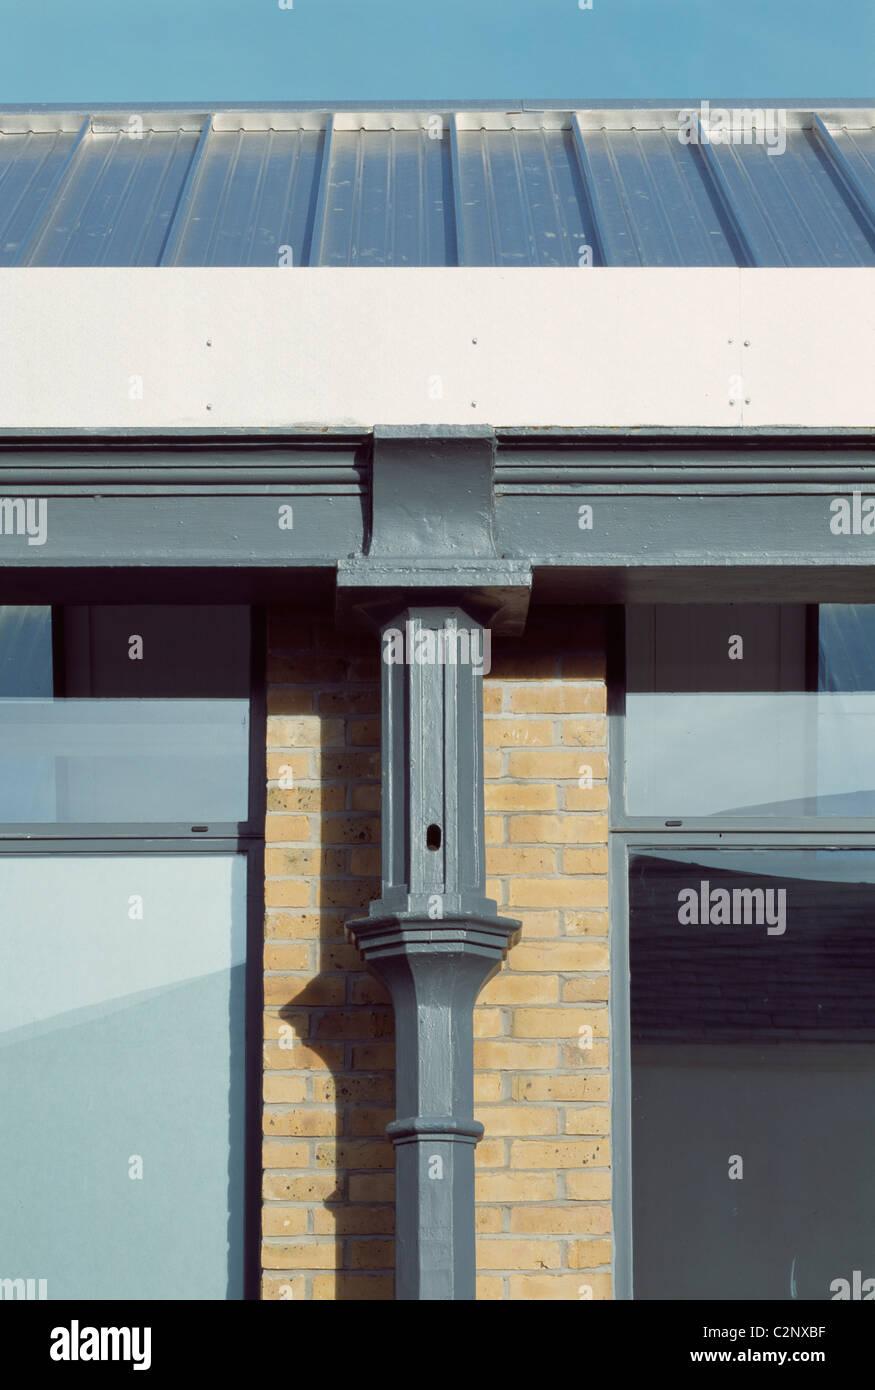 RSA IV Enfield, London. Roof Column detail. - Stock Image